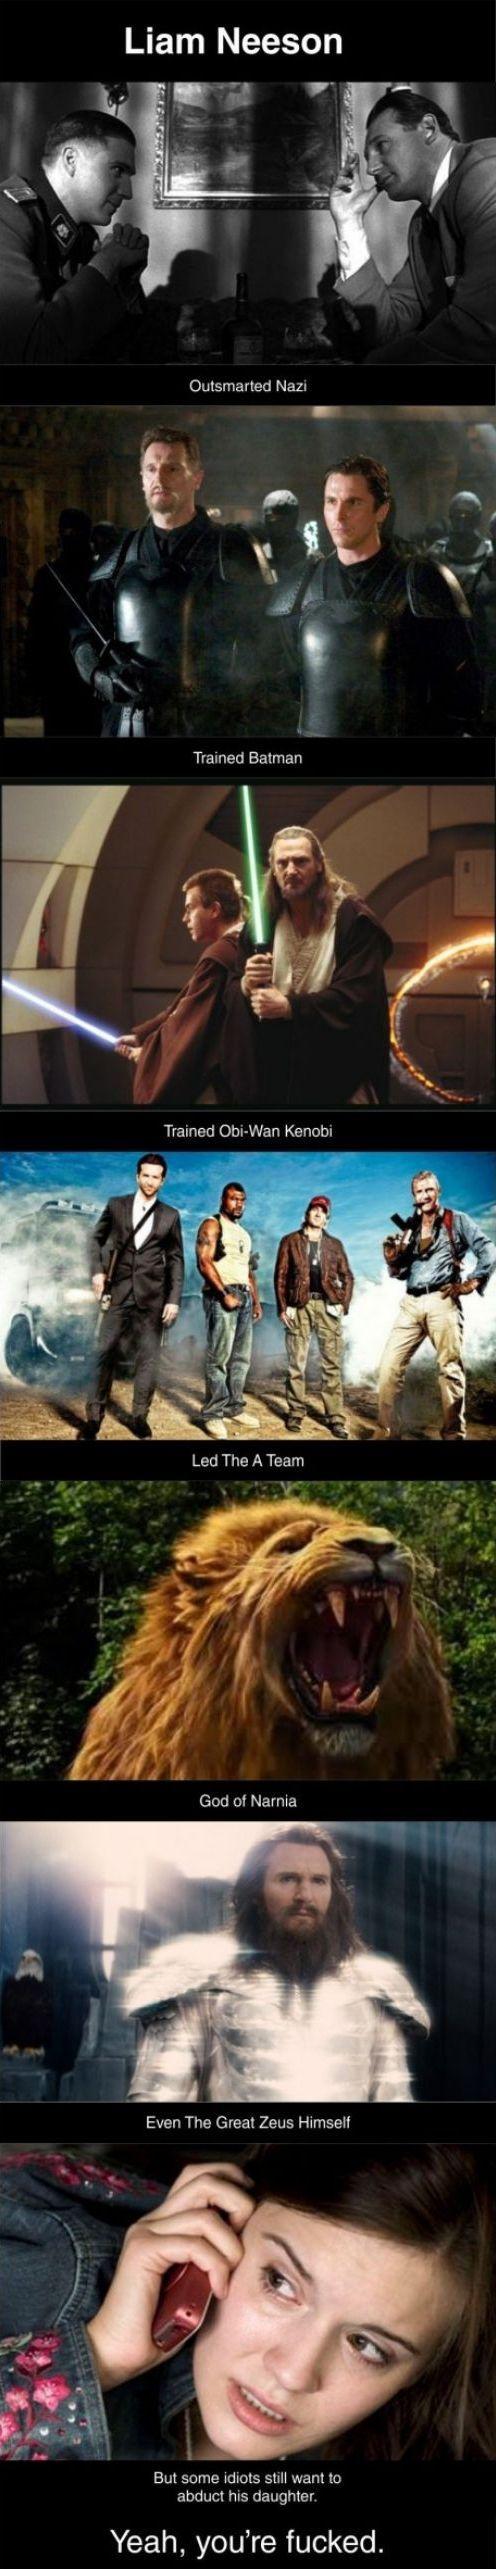 Liam Neeson Is a Badass